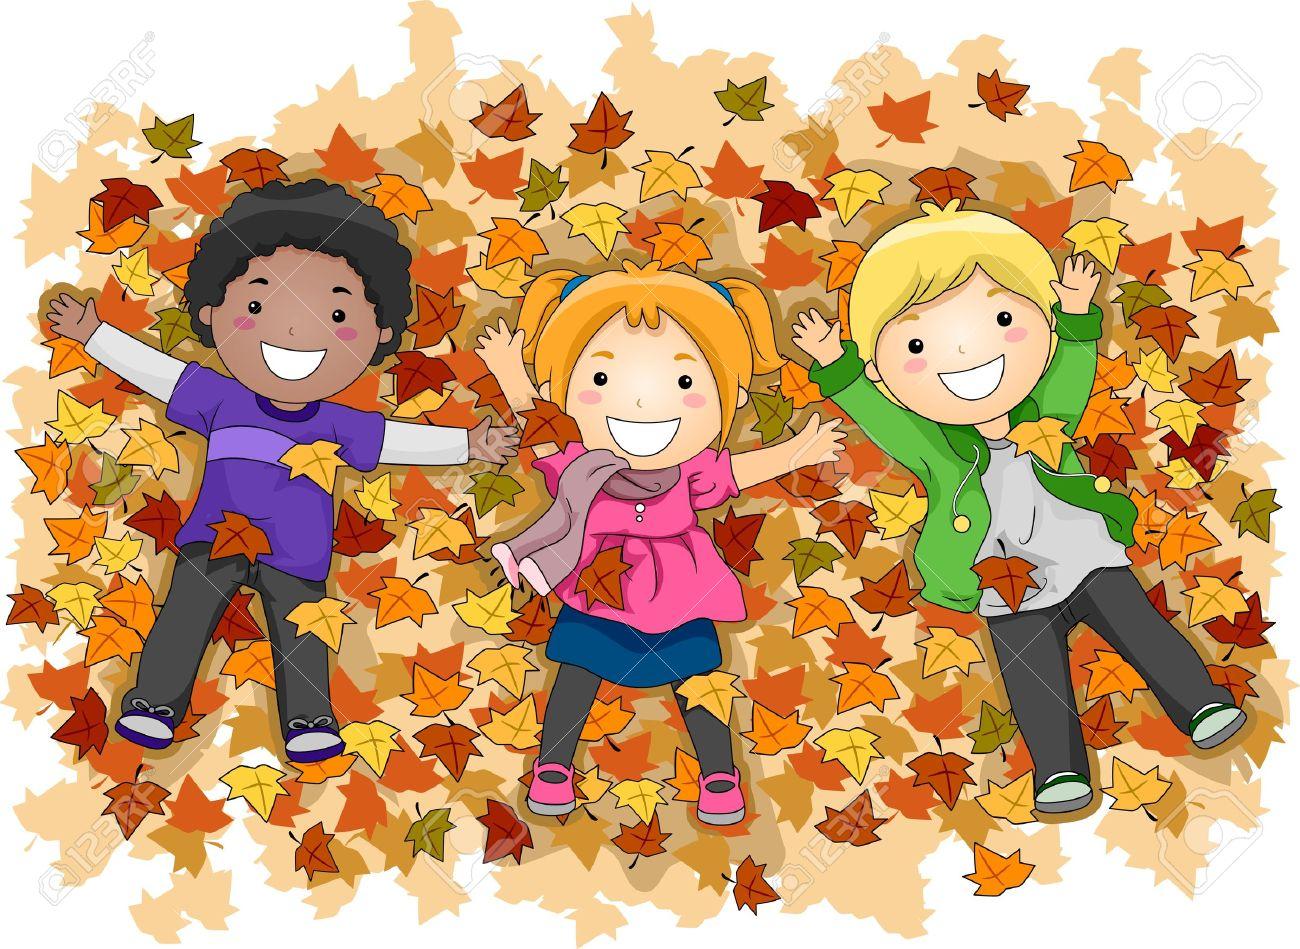 Image result for fall leaves children jumping banner